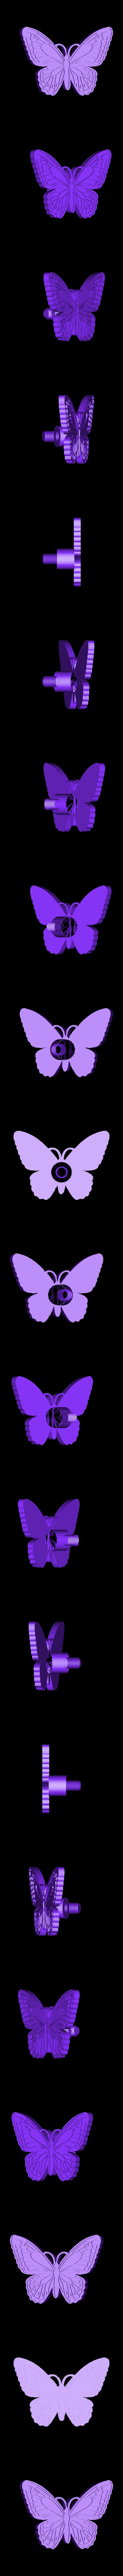 portomine_poignee_papillon01.STL Download STL file Portomine butterfly hook • 3D printing design, Tibe-Design